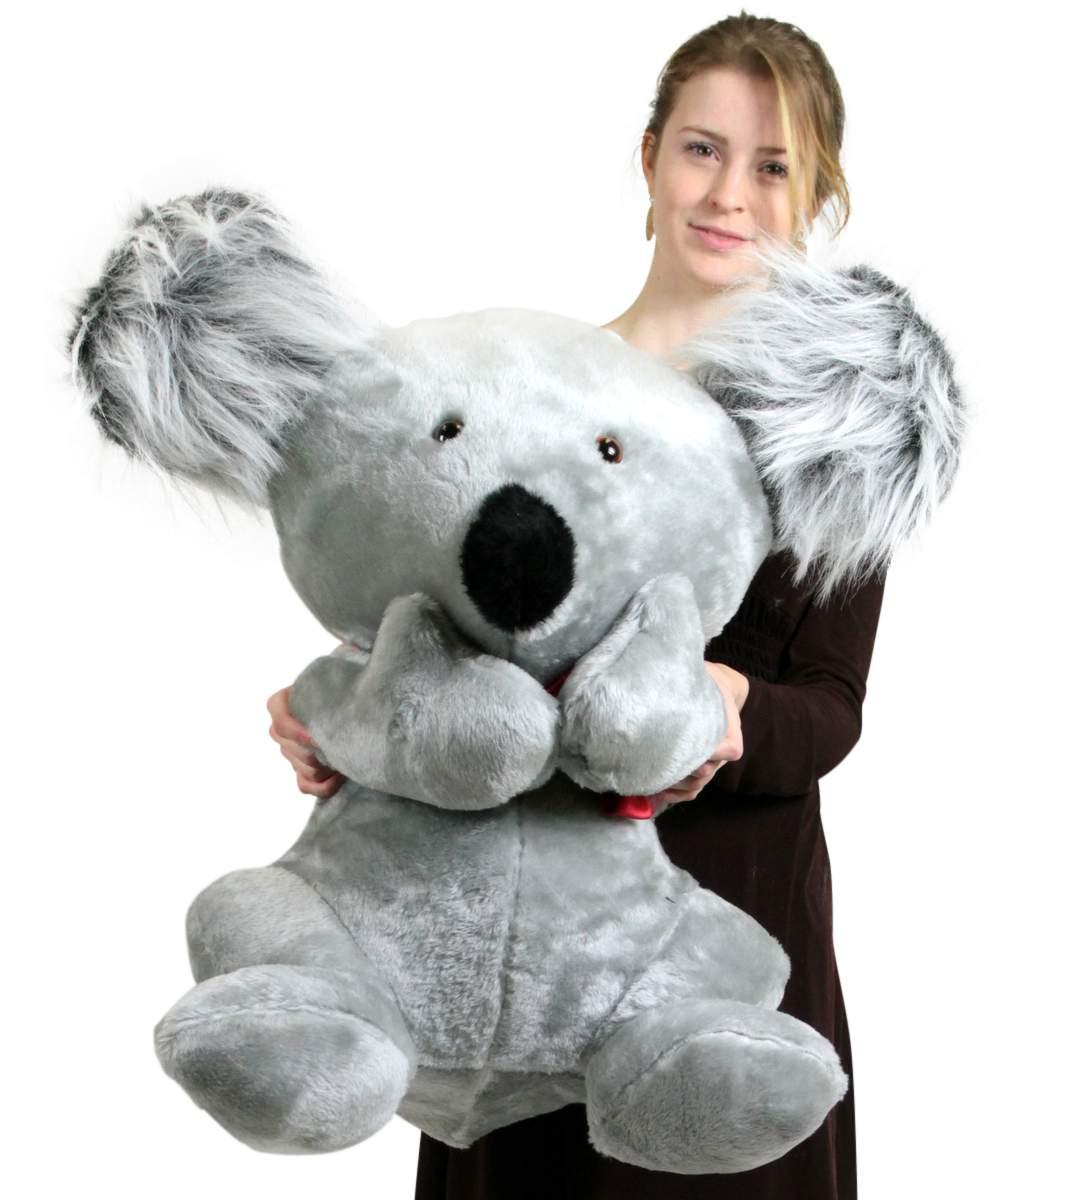 American Made Large Stuffed Koala Bear 26 Inches Soft Big Plush